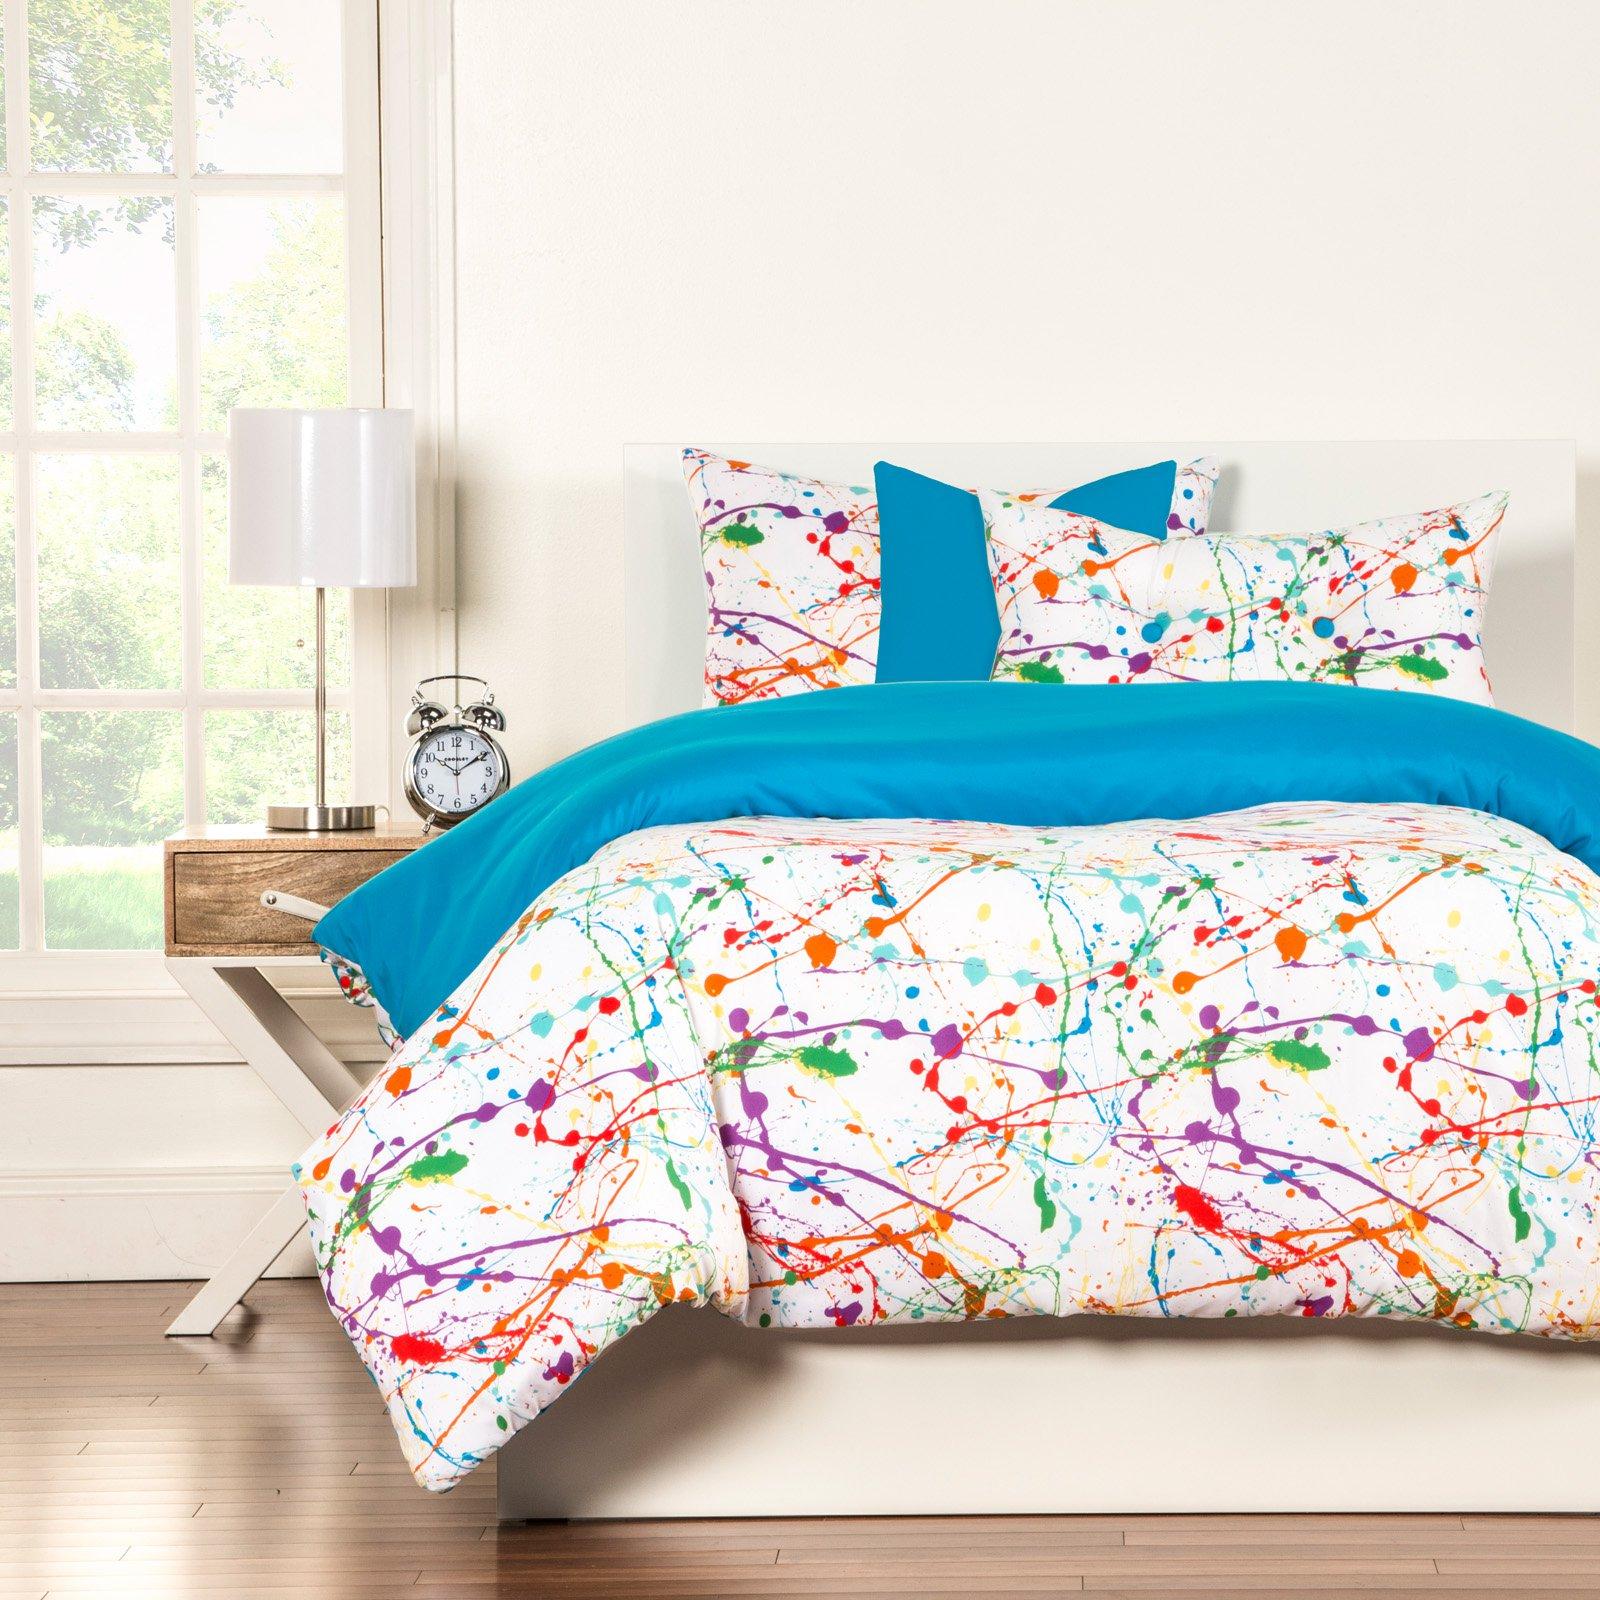 Splat Duvet Set By Crayola Home Decor Bedding Duvet Sets Home